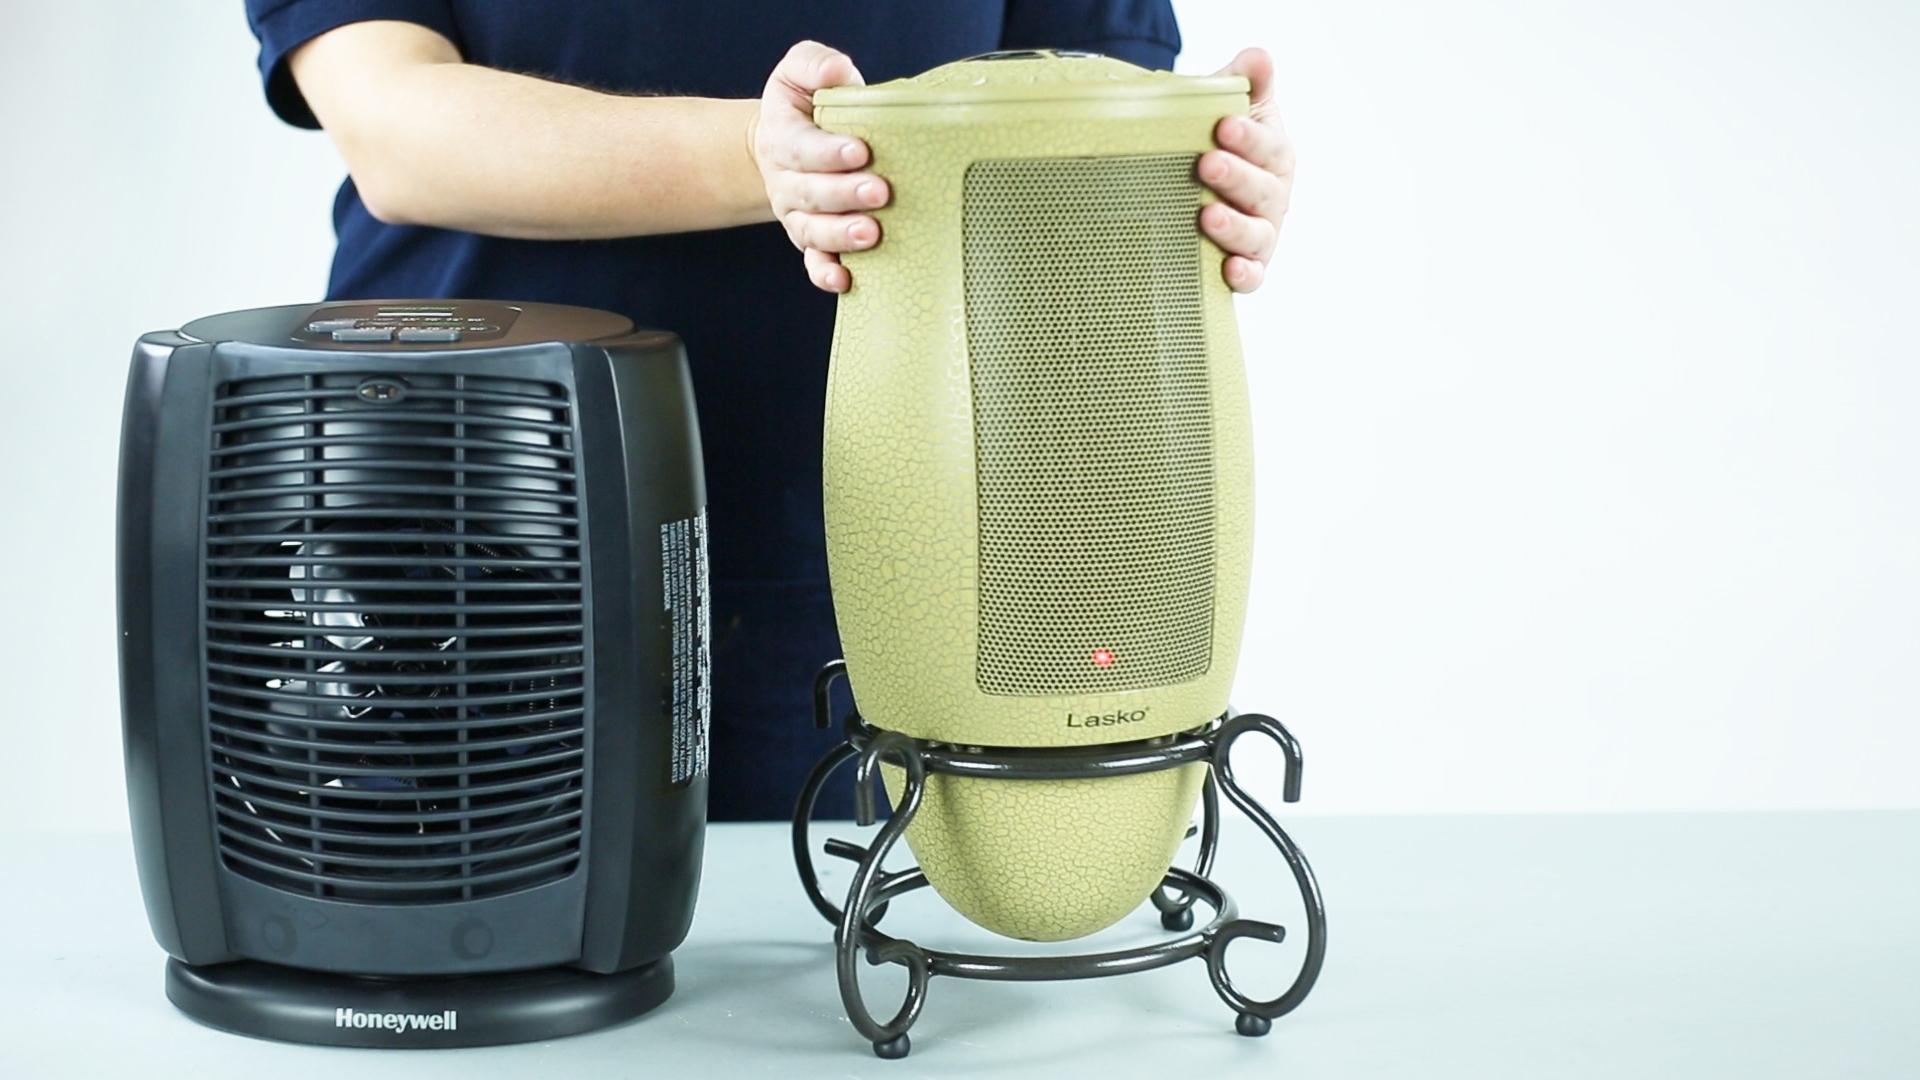 Safest Space Heater For Basement